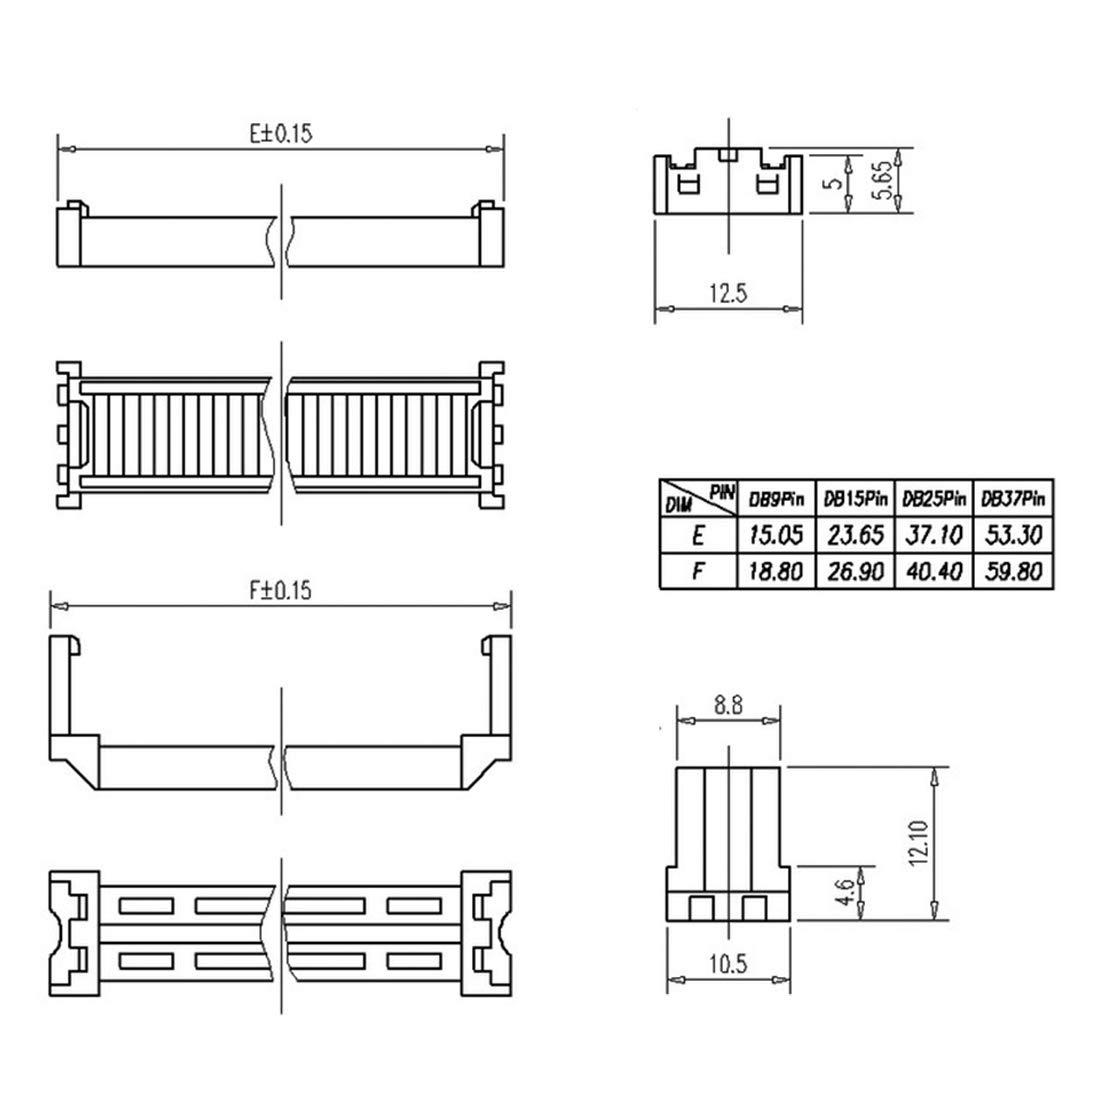 sourcing map Flachbandkabel Anschluss IDC D-Sub 25 Pin 2 Reihe Buchse Sockel IDC Crimp Port